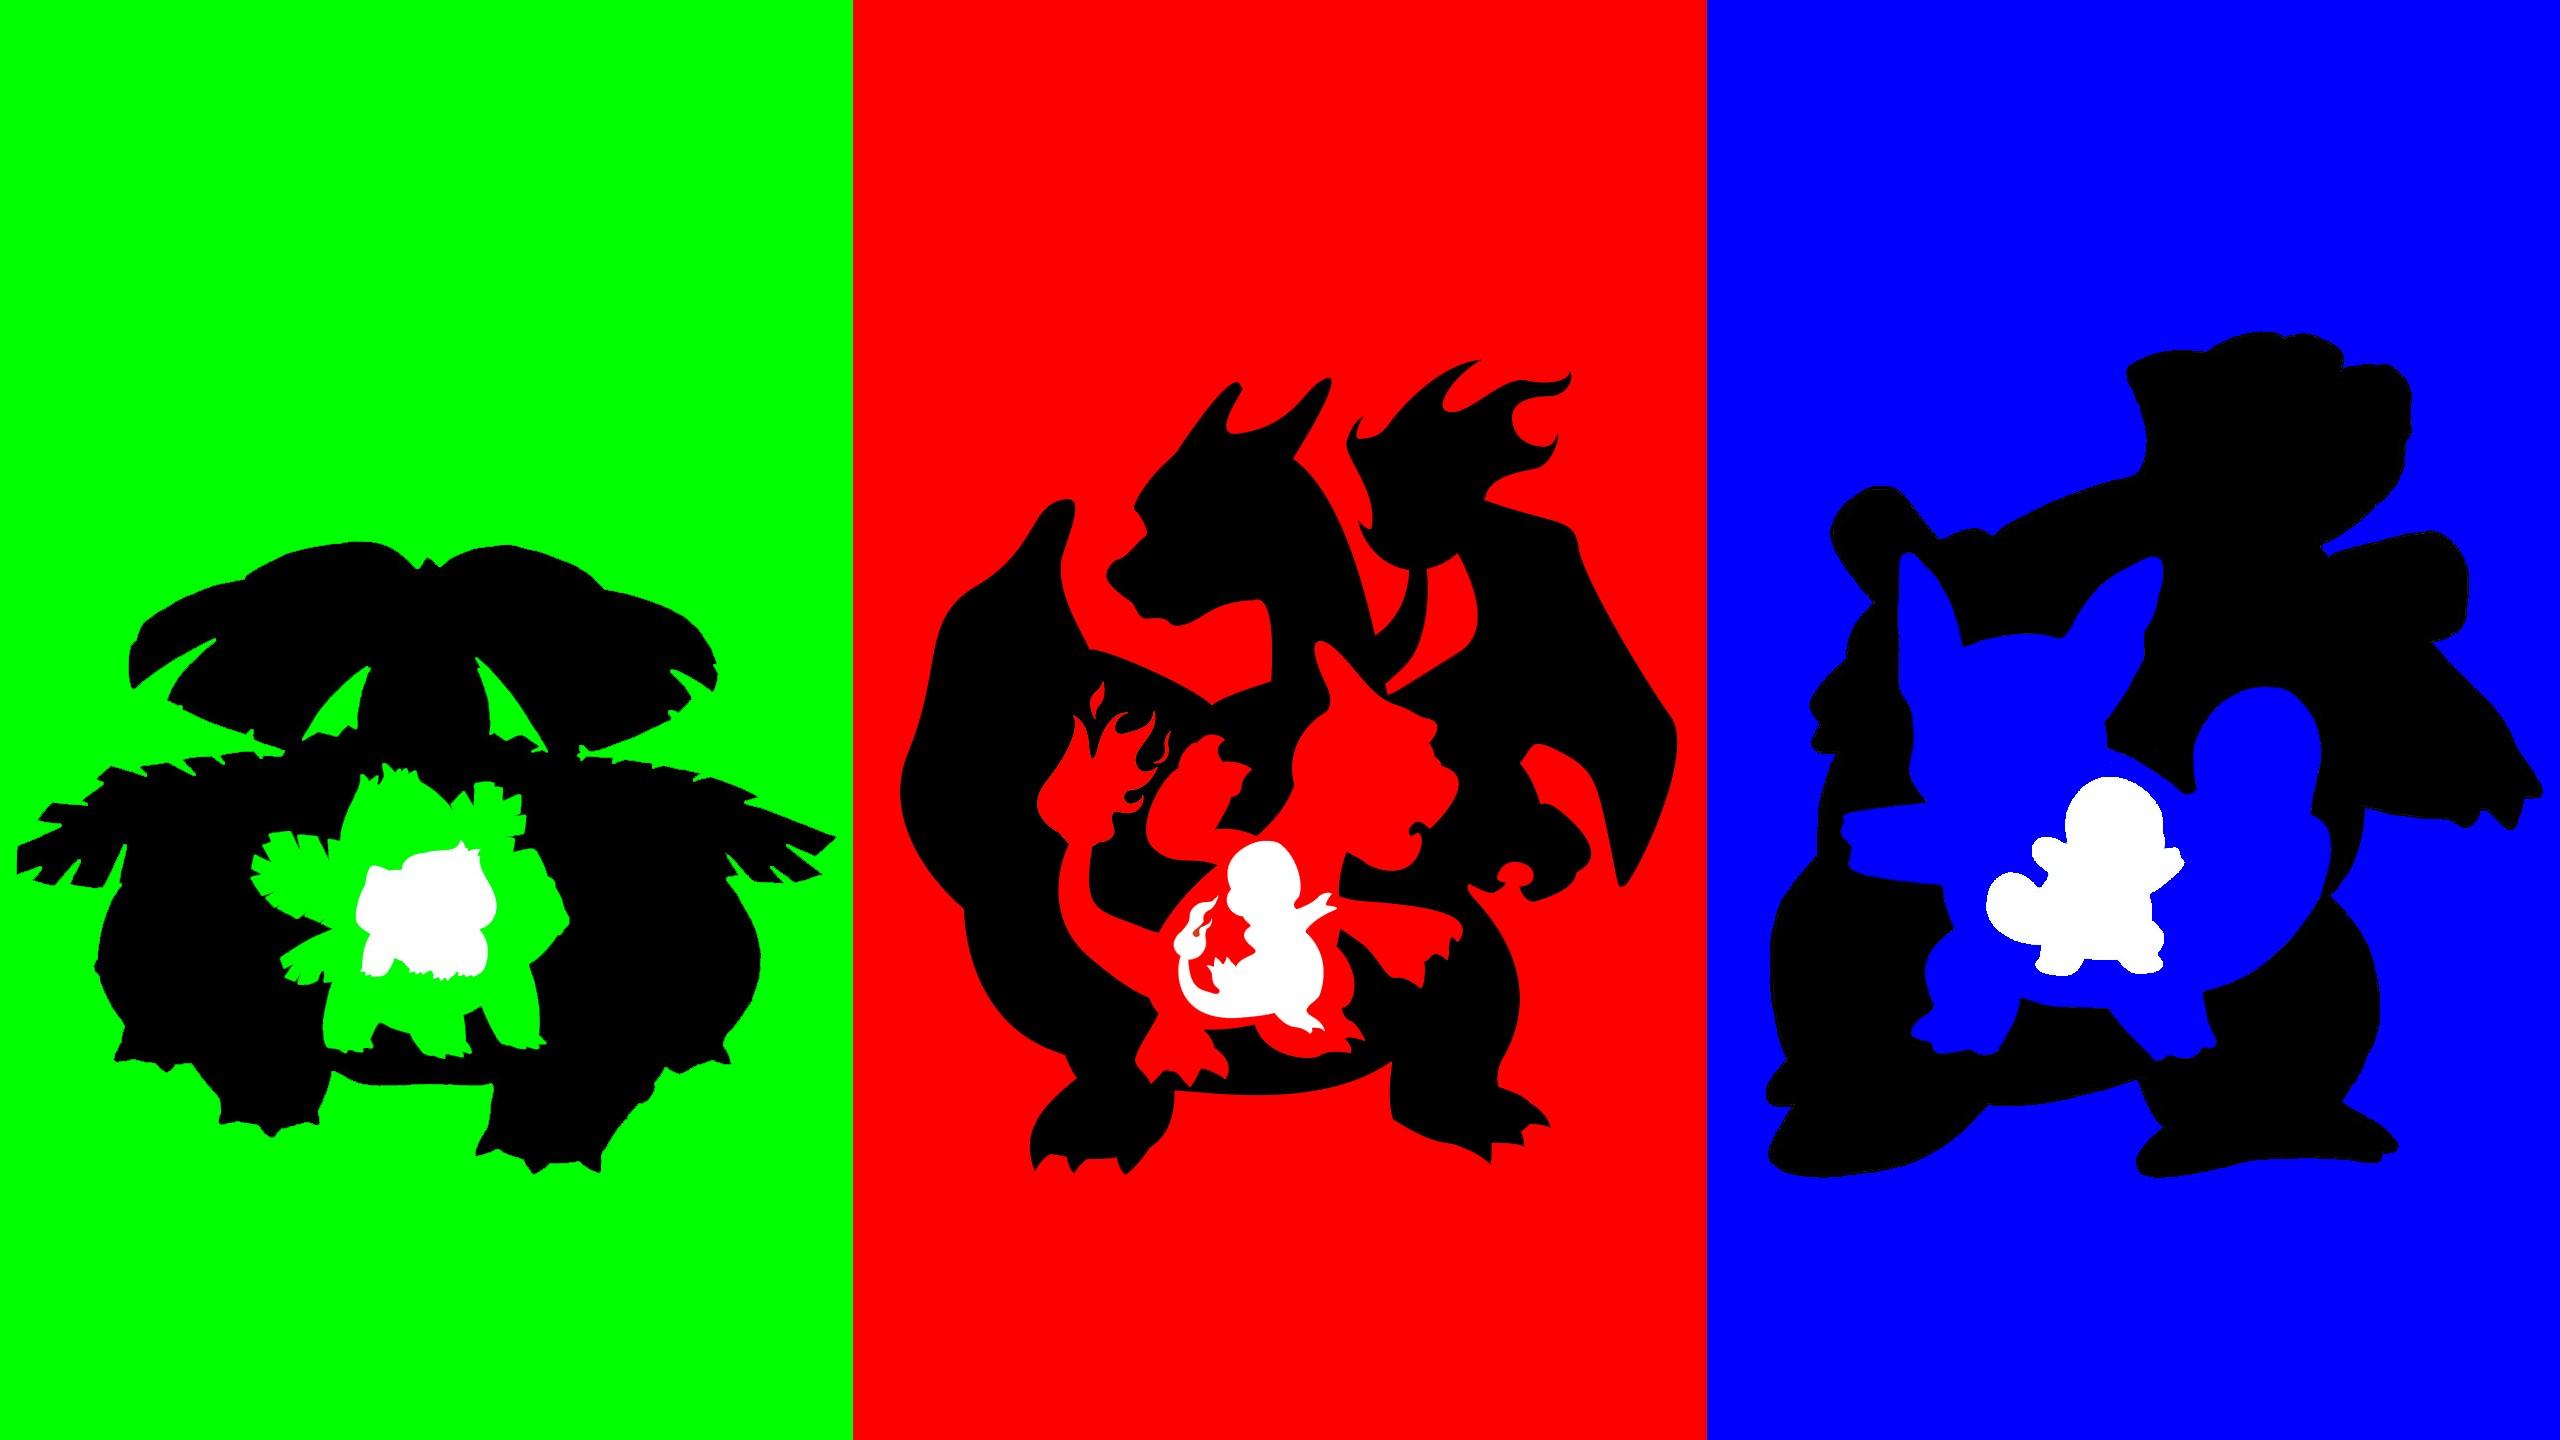 Ultralinx Wallpaper Iphone X 56 Cool Pokemon Wallpapers 183 ① Download Free Amazing